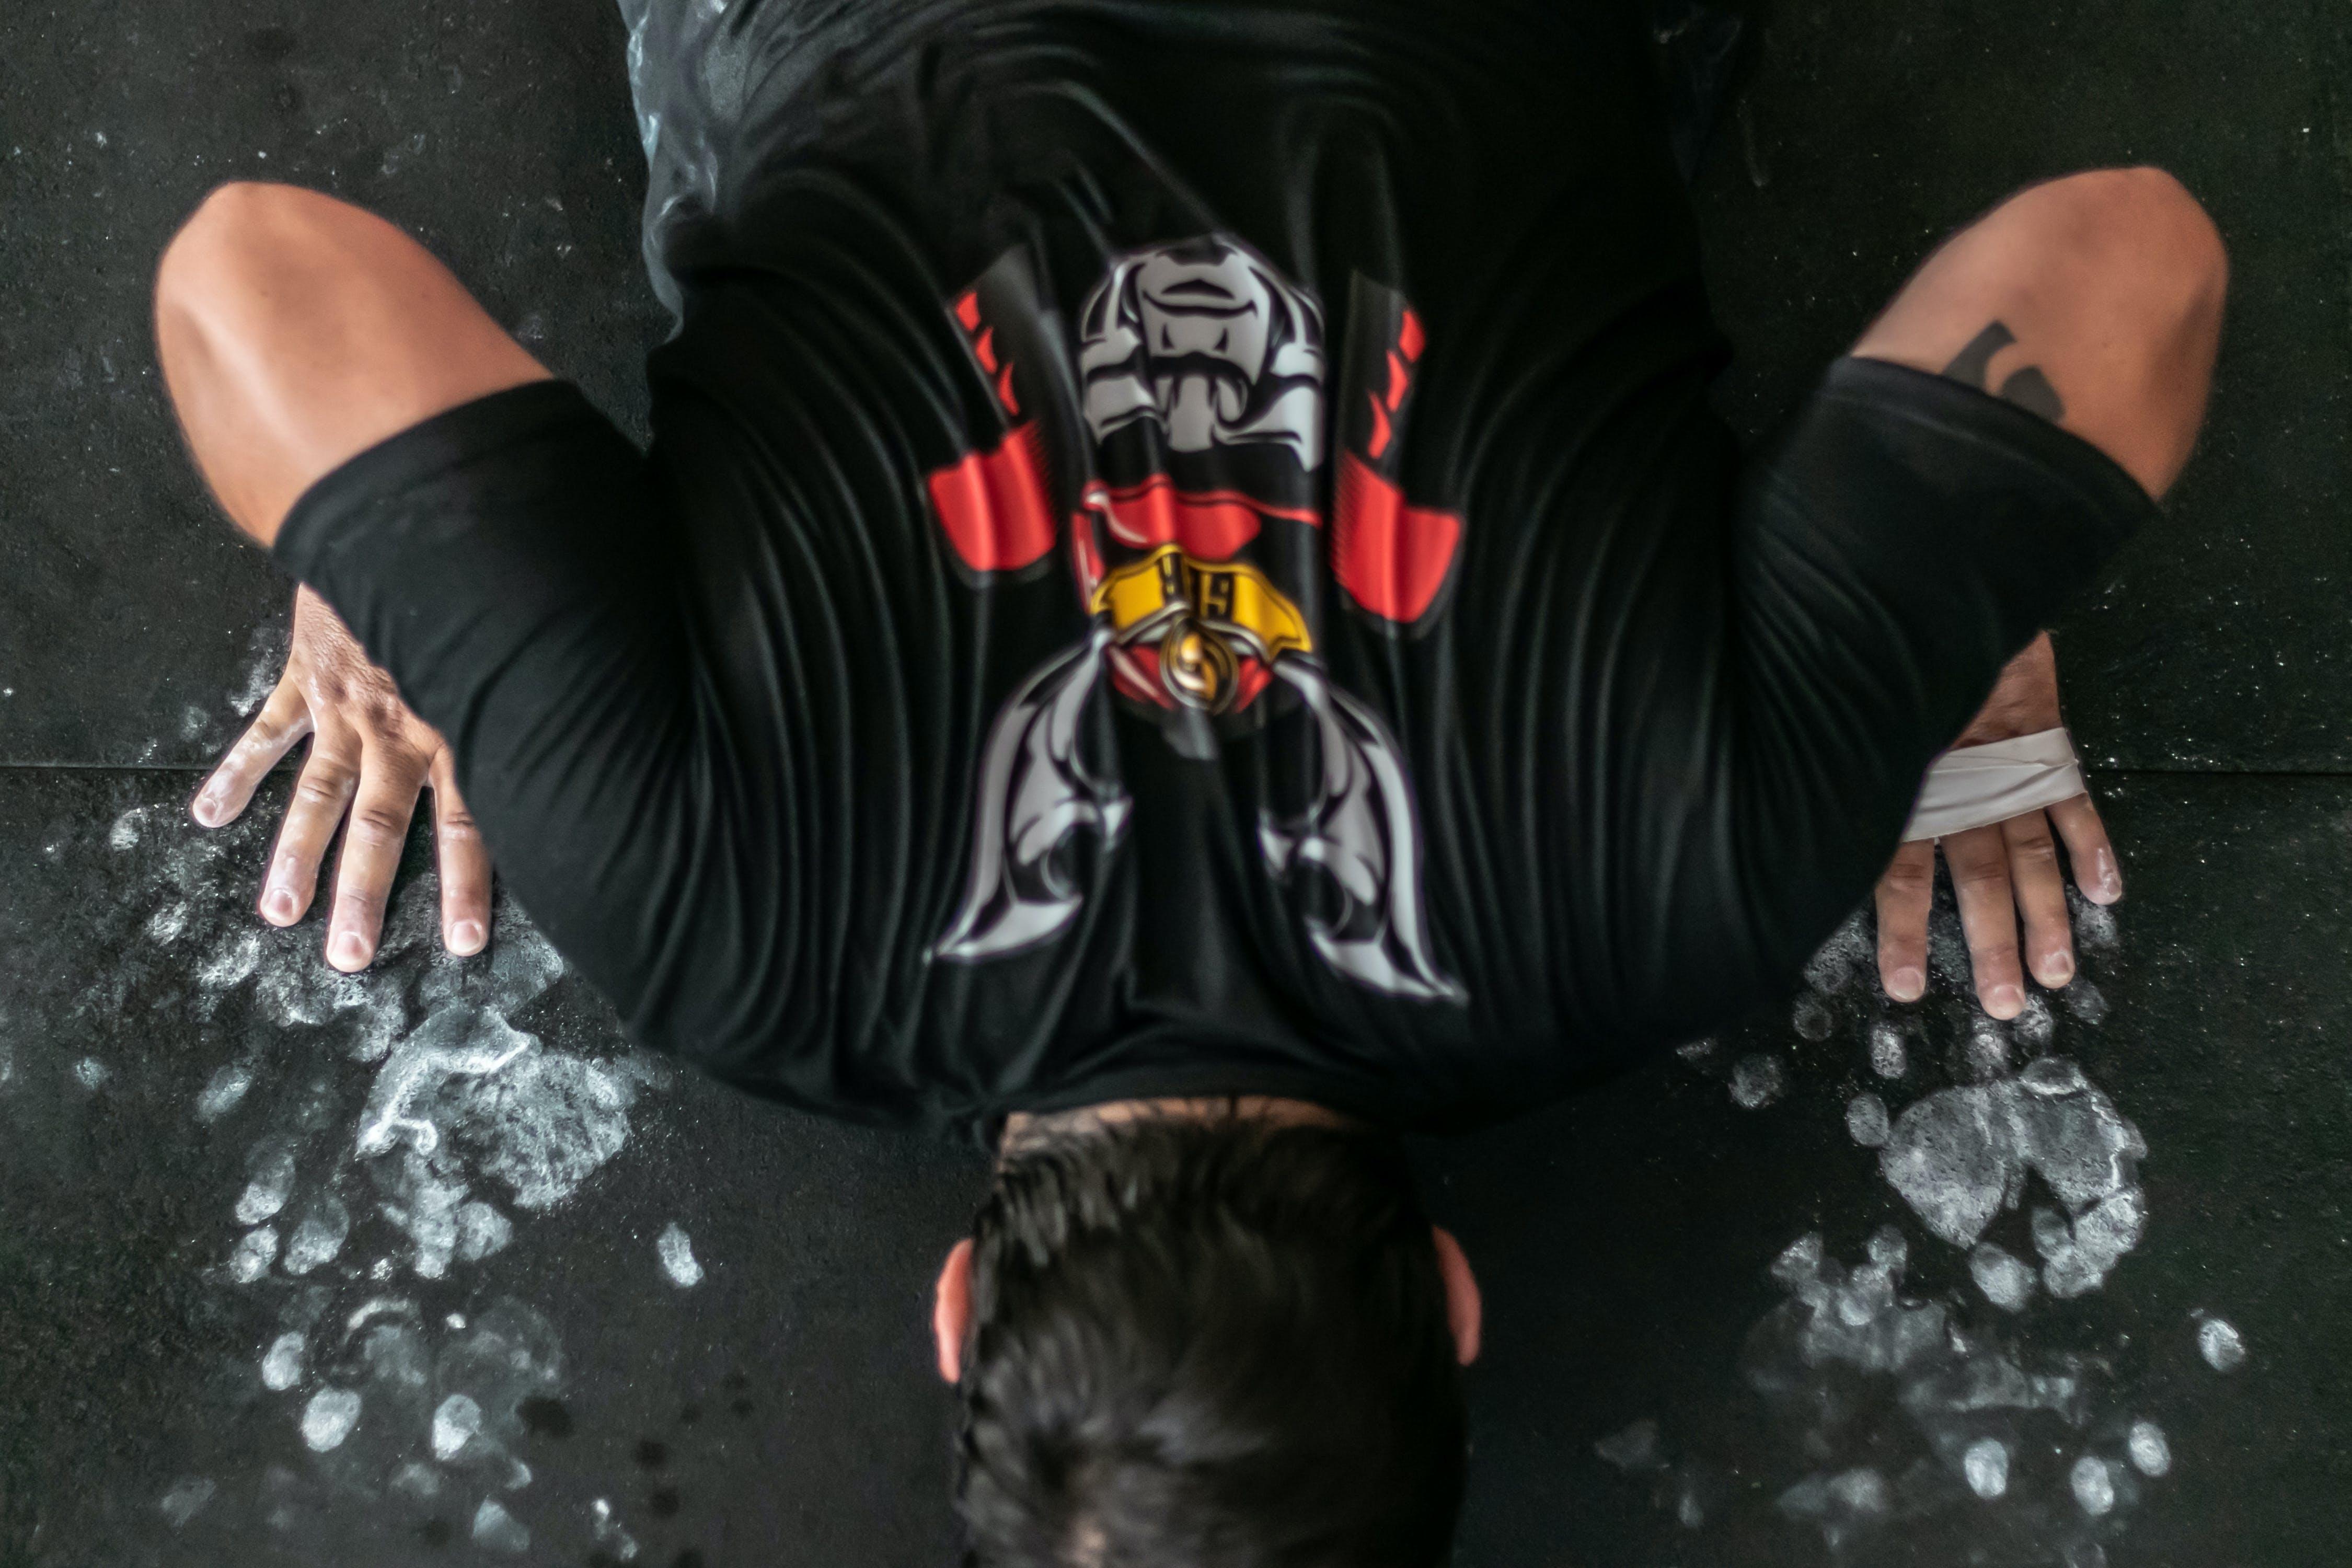 crossfit, crossfit training, exercise